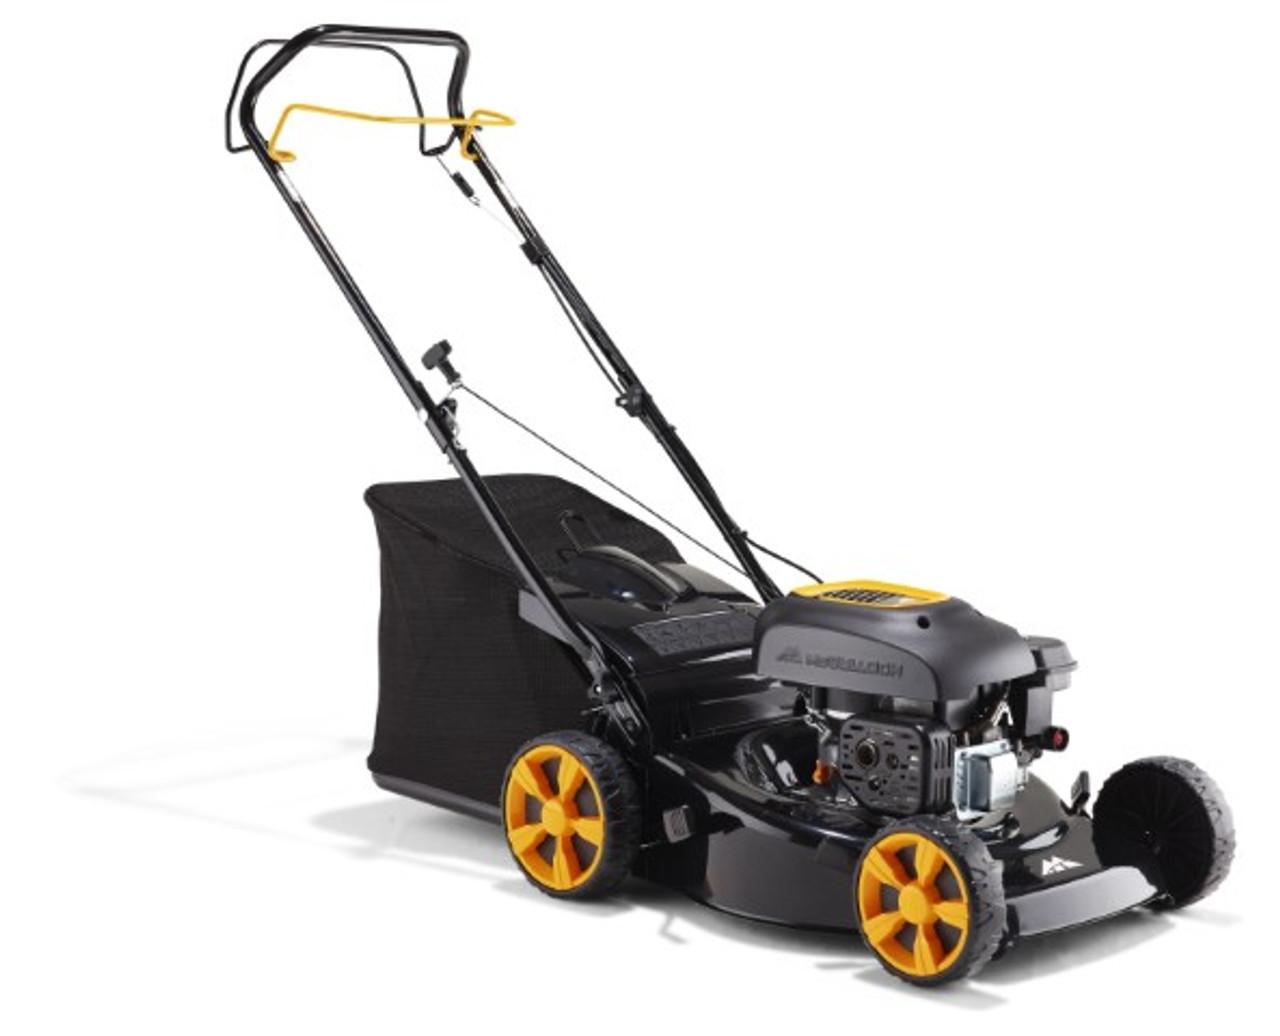 McCulloch M46-110R Rotary Push Mower